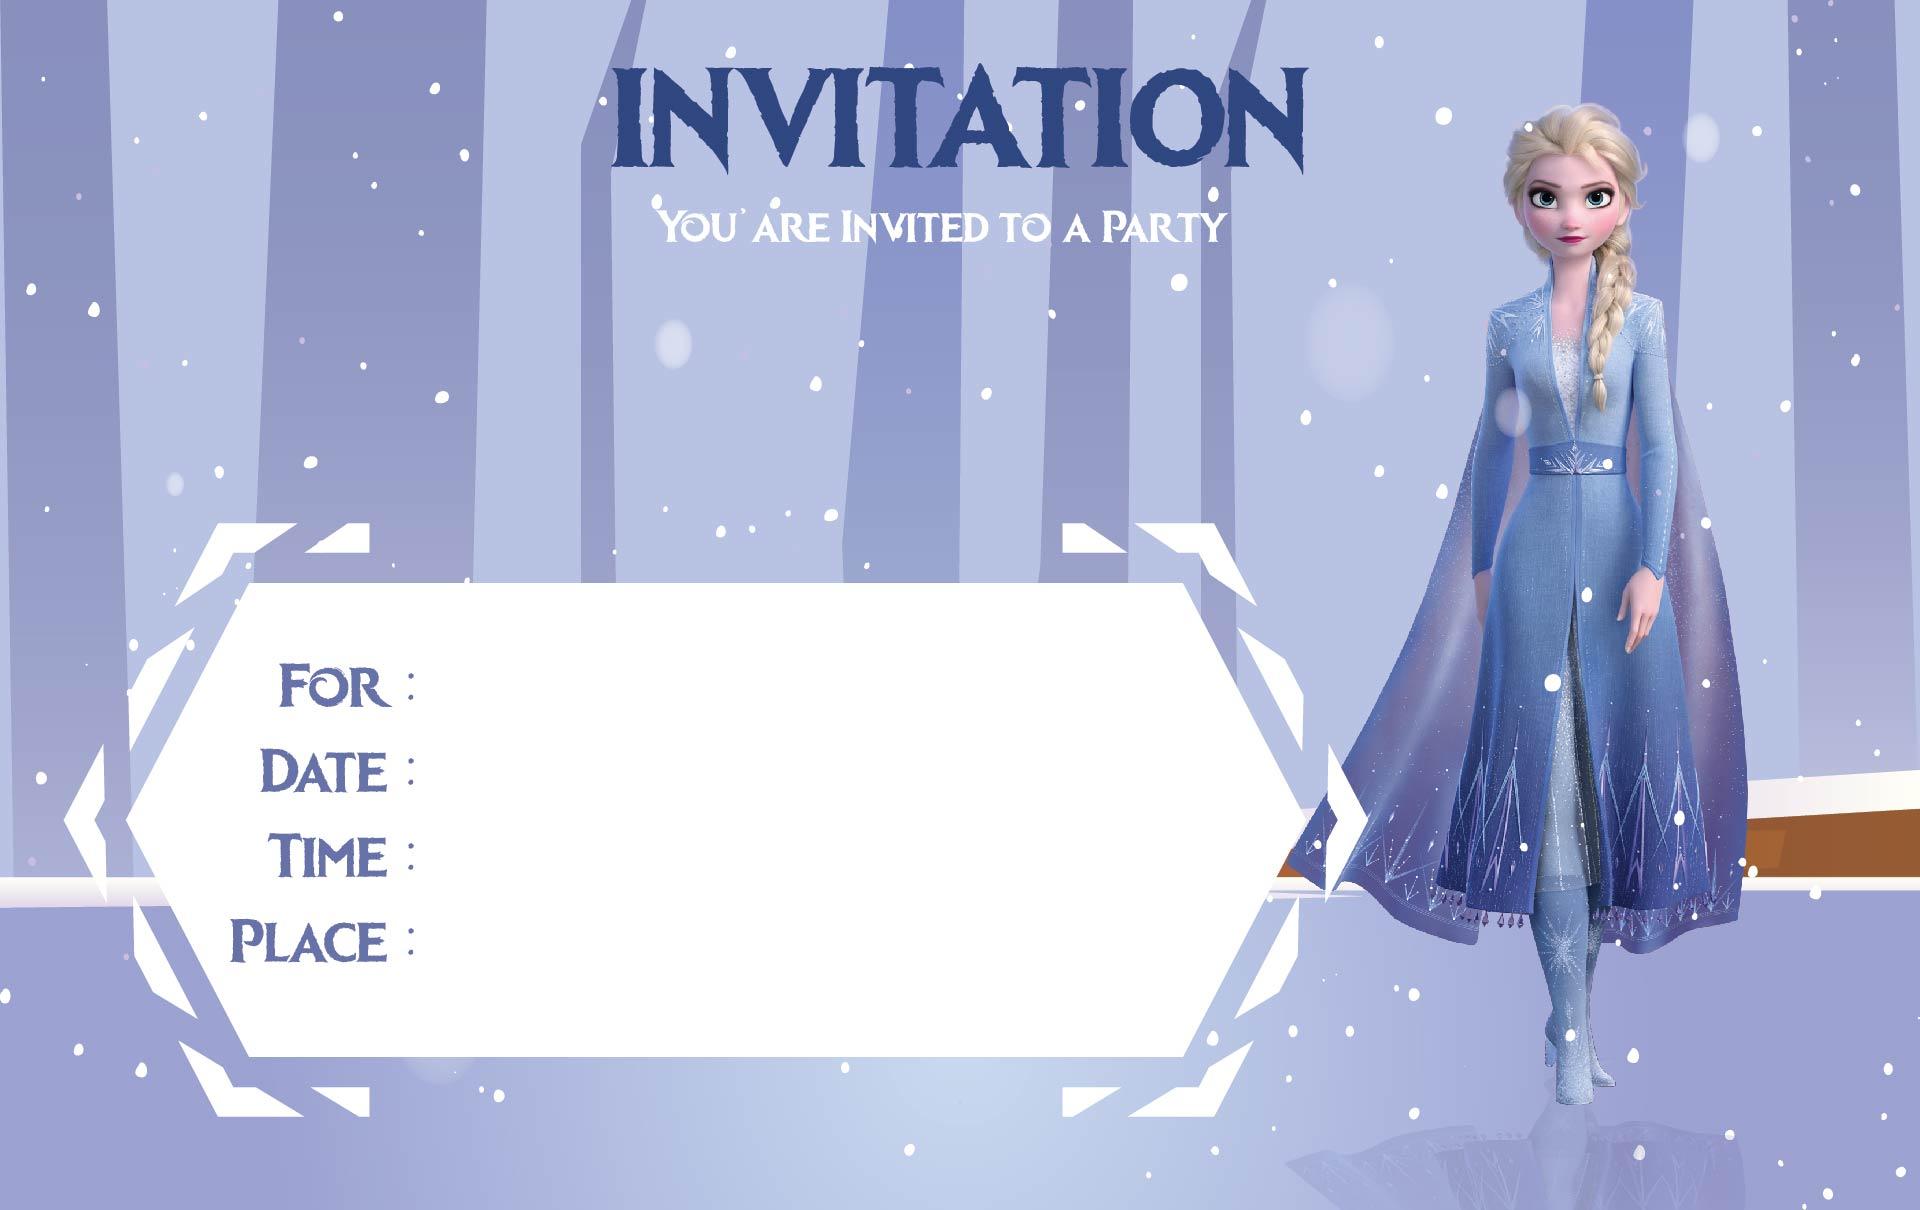 Elsa Frozen Birthday Party Invitations Editable